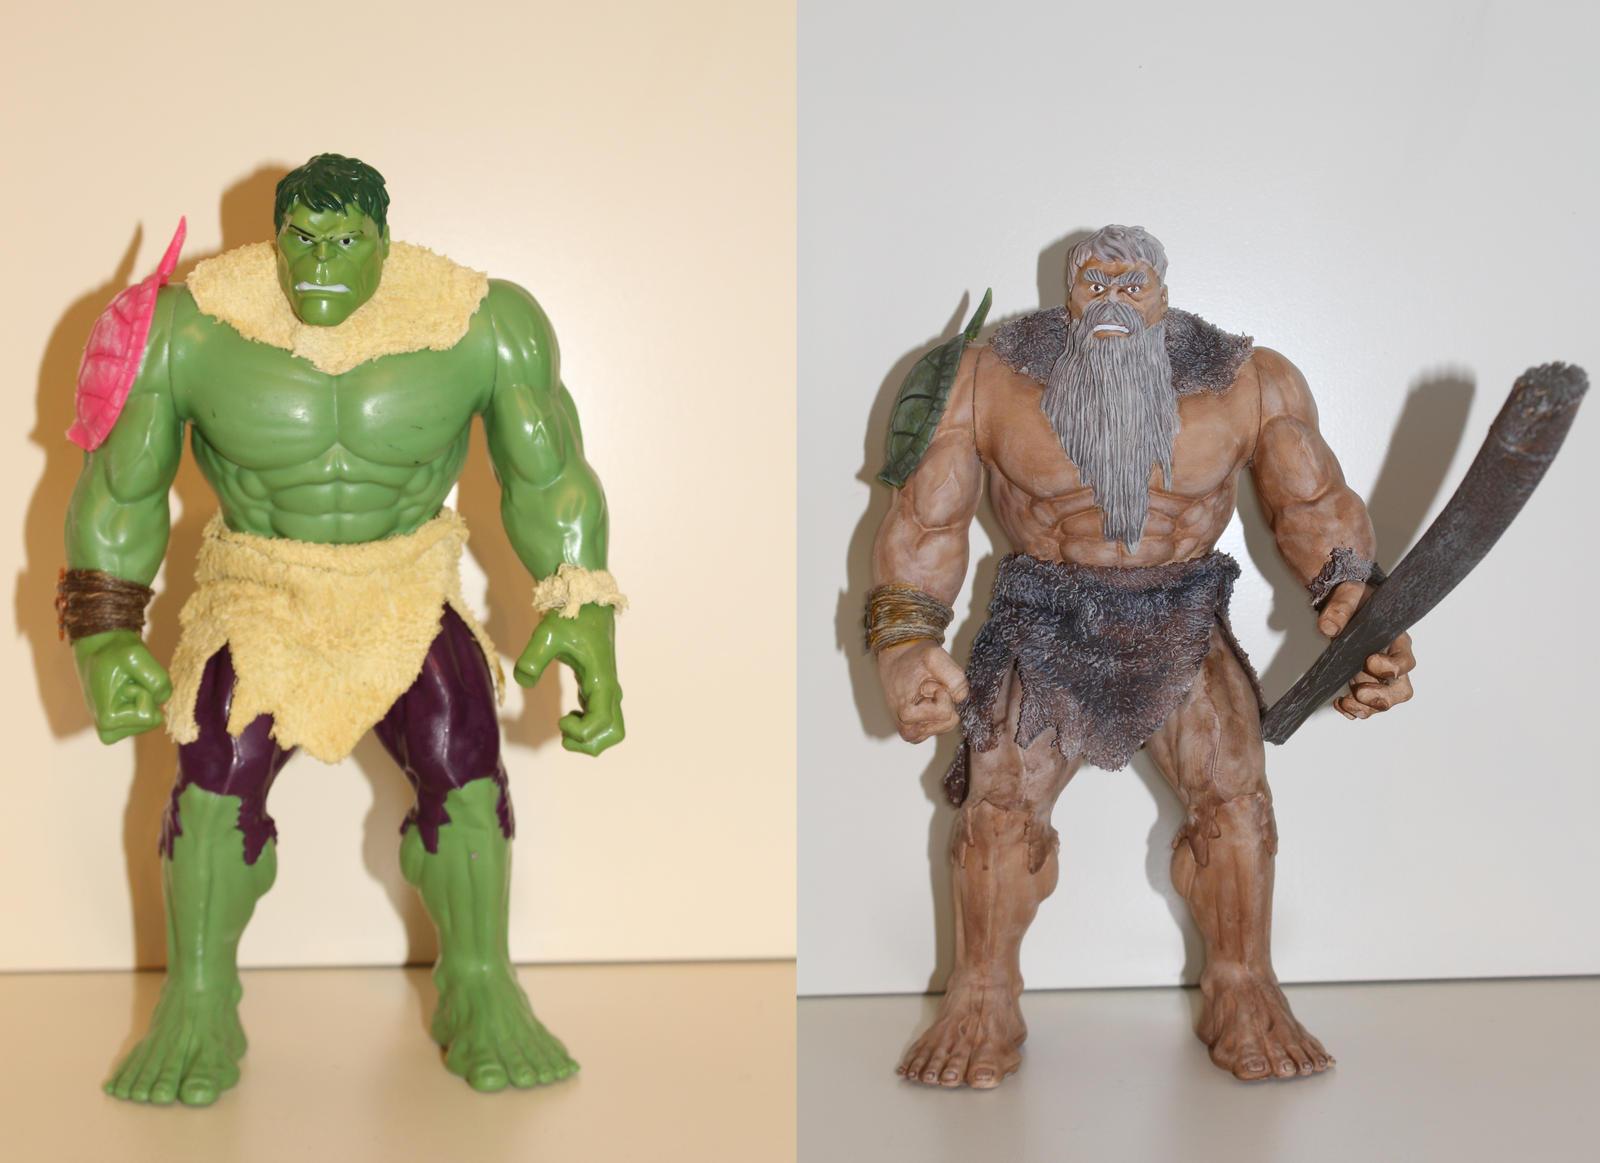 Hulk to titan conversion by MrVergee